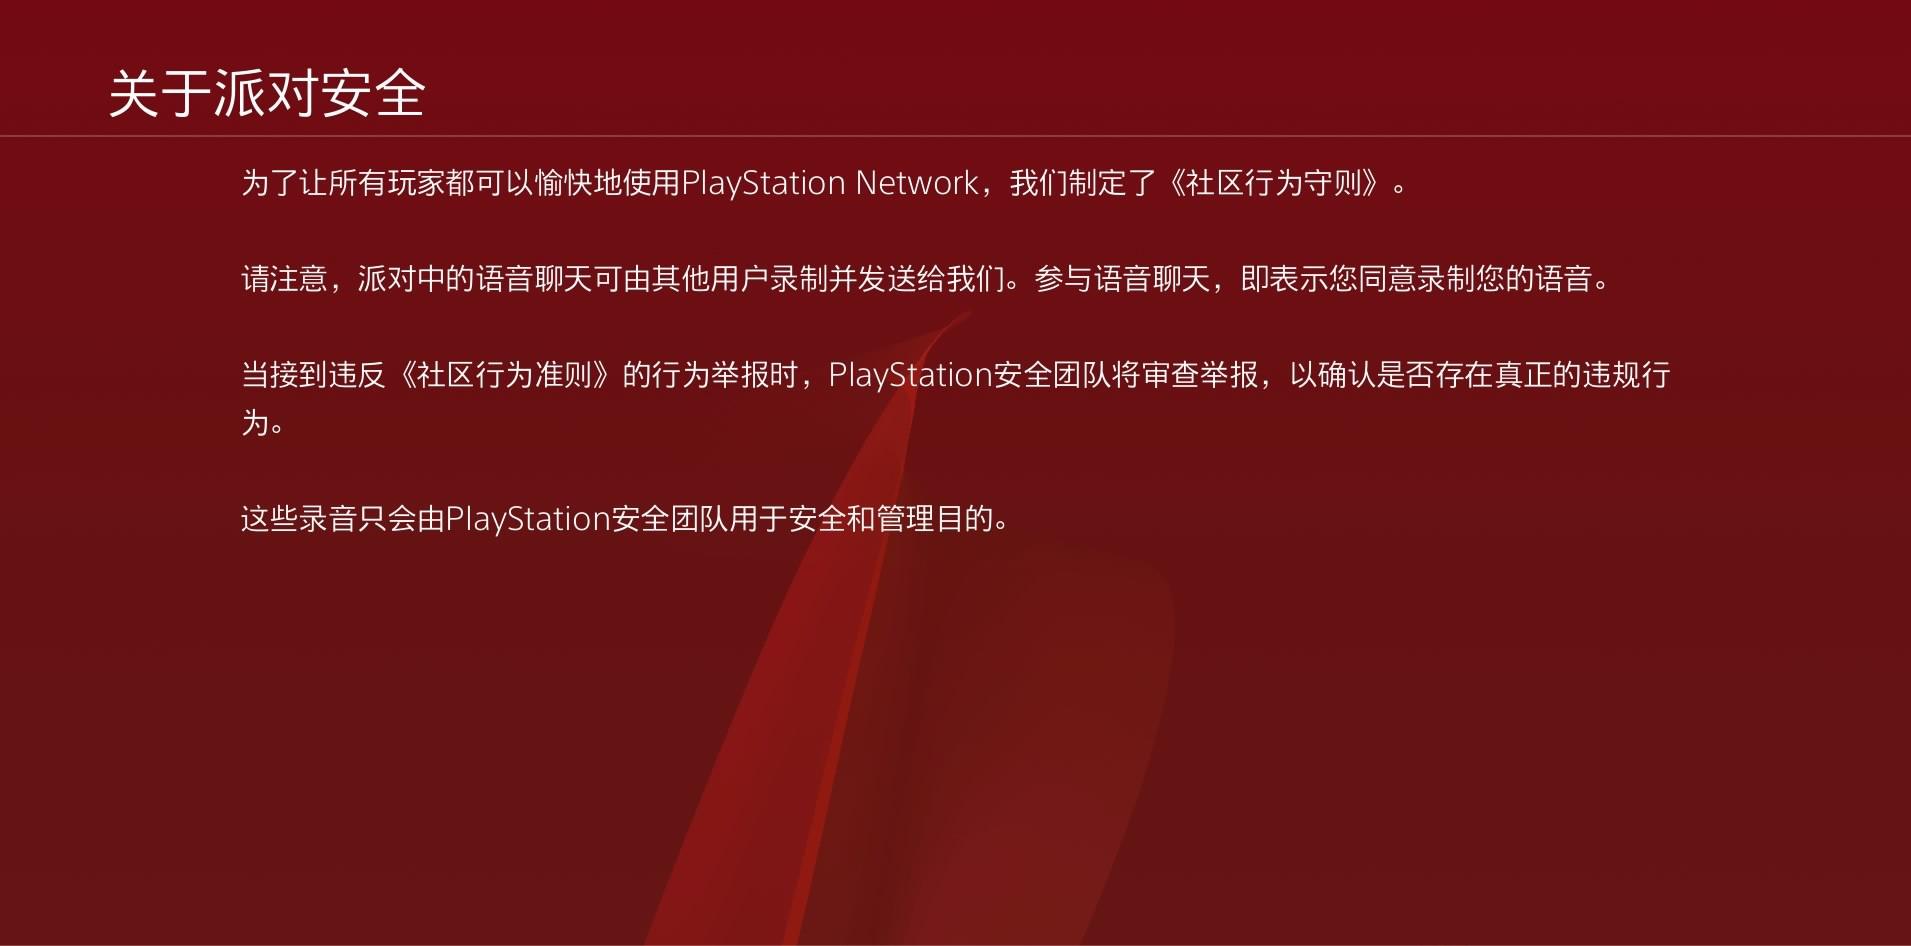 PS5派对内语音聊天将能被录音 用作用户调解